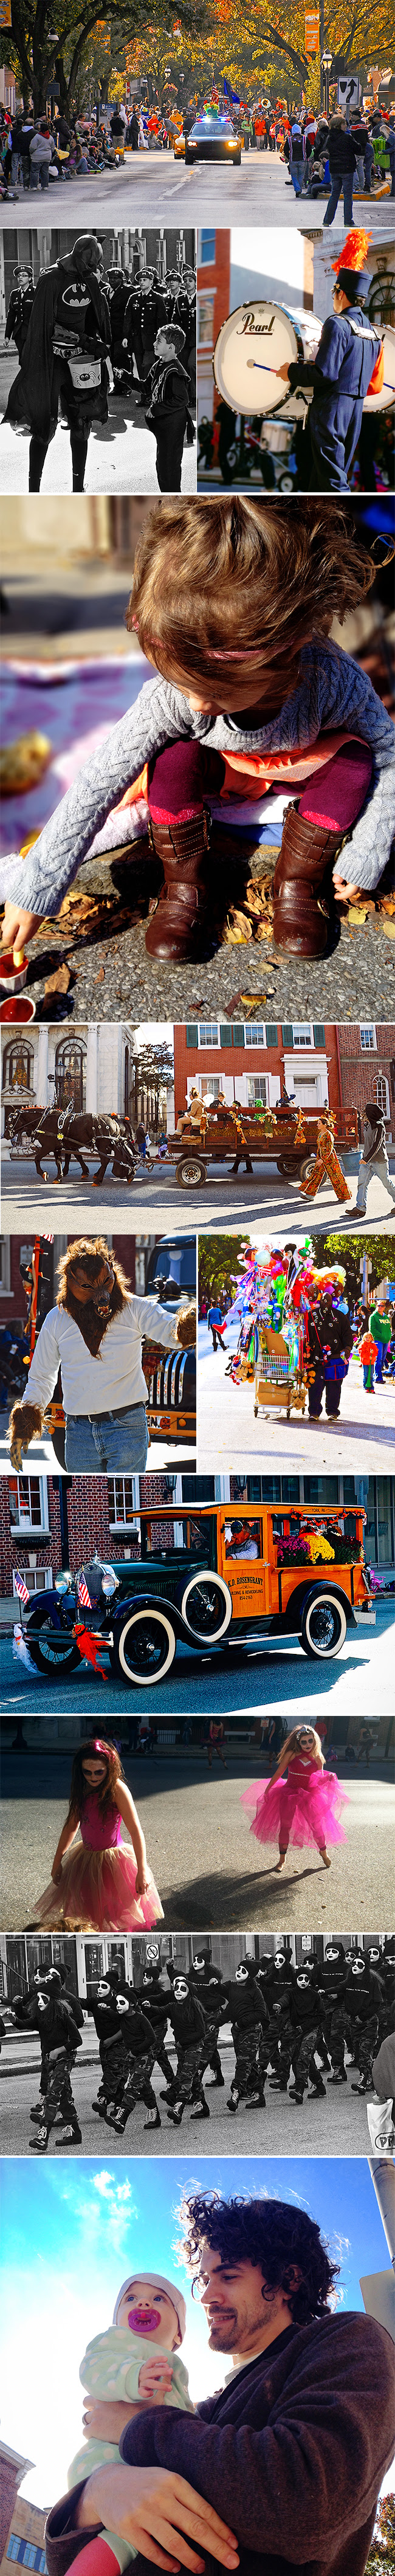 A-Lovely-Lark-Halloween-Parade